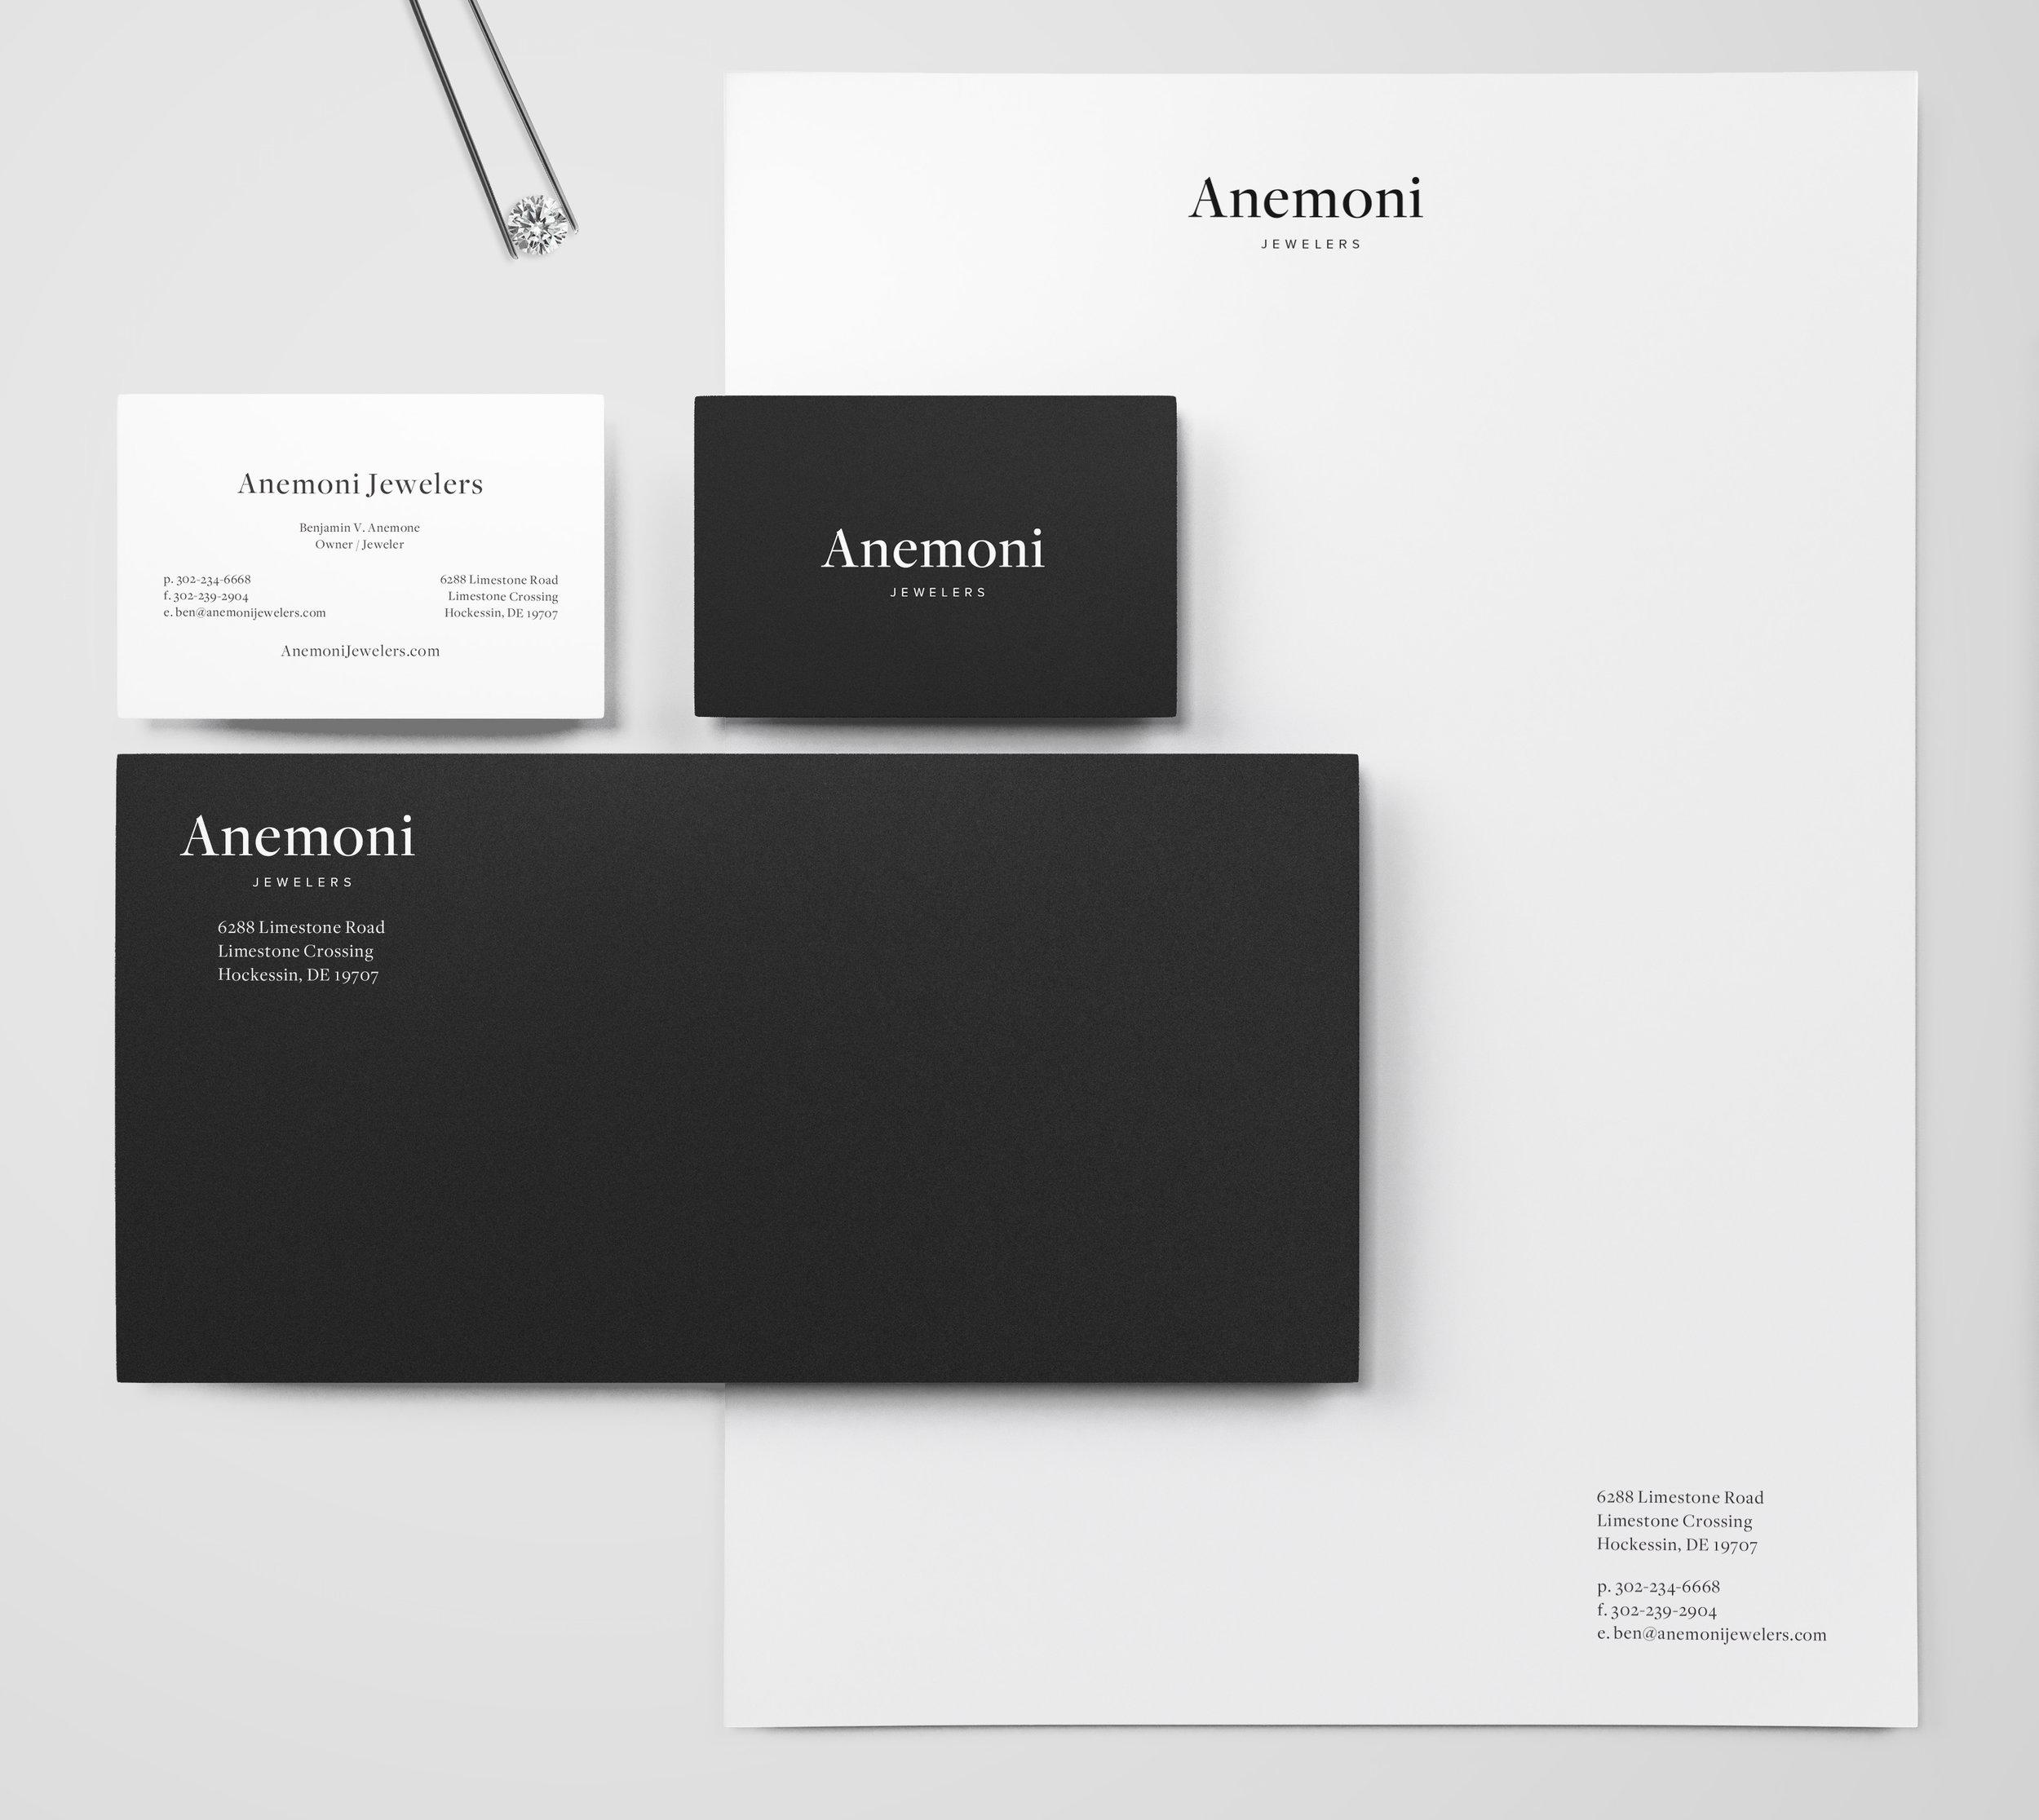 Artful-Union-Anemoni-Jewelers-Black-White-Business-Stationery-SetA.jpg